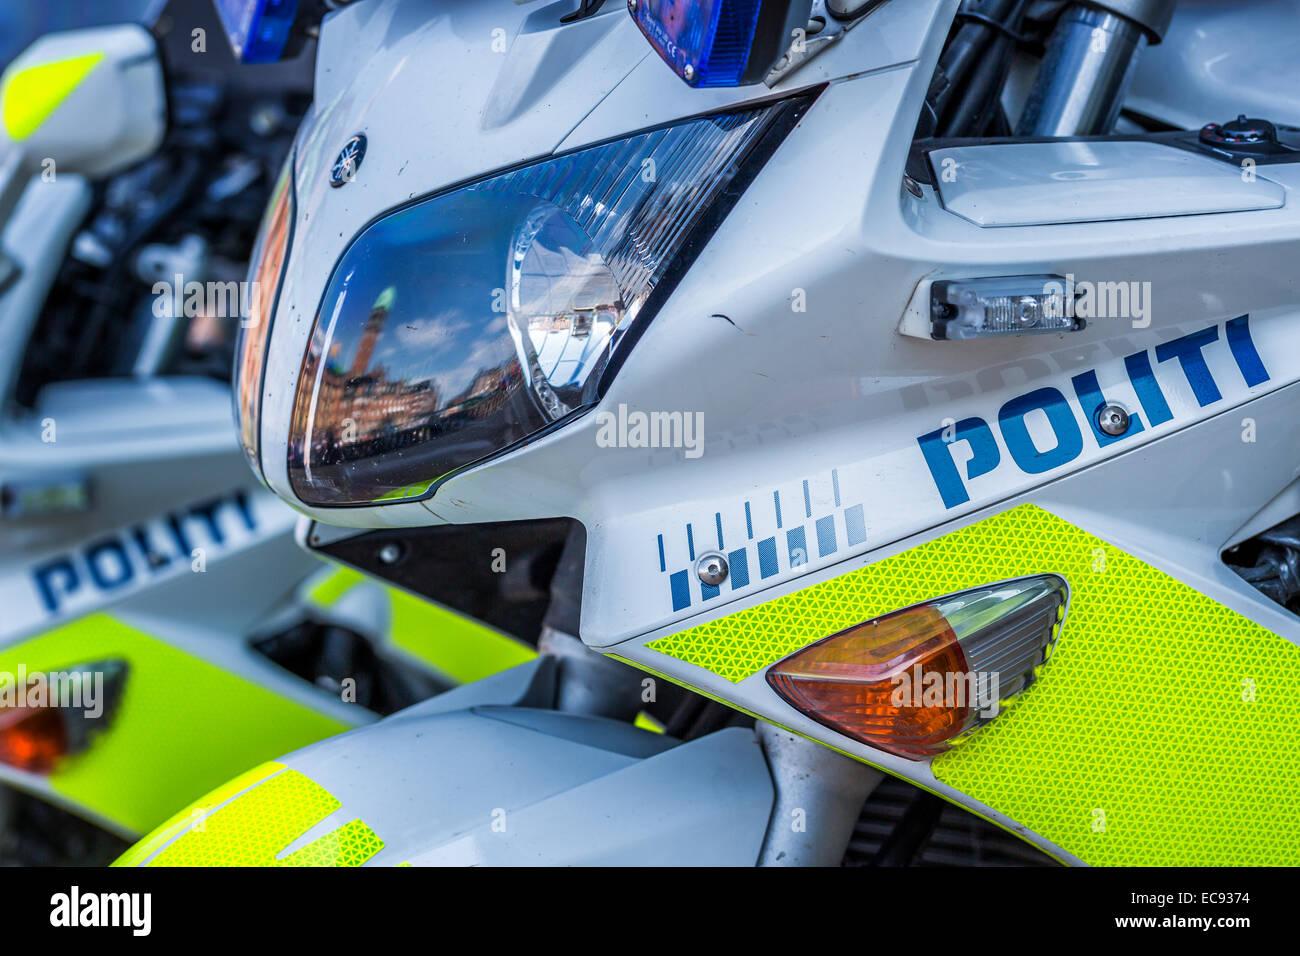 Police motorbikes, Denmark - Stock Image